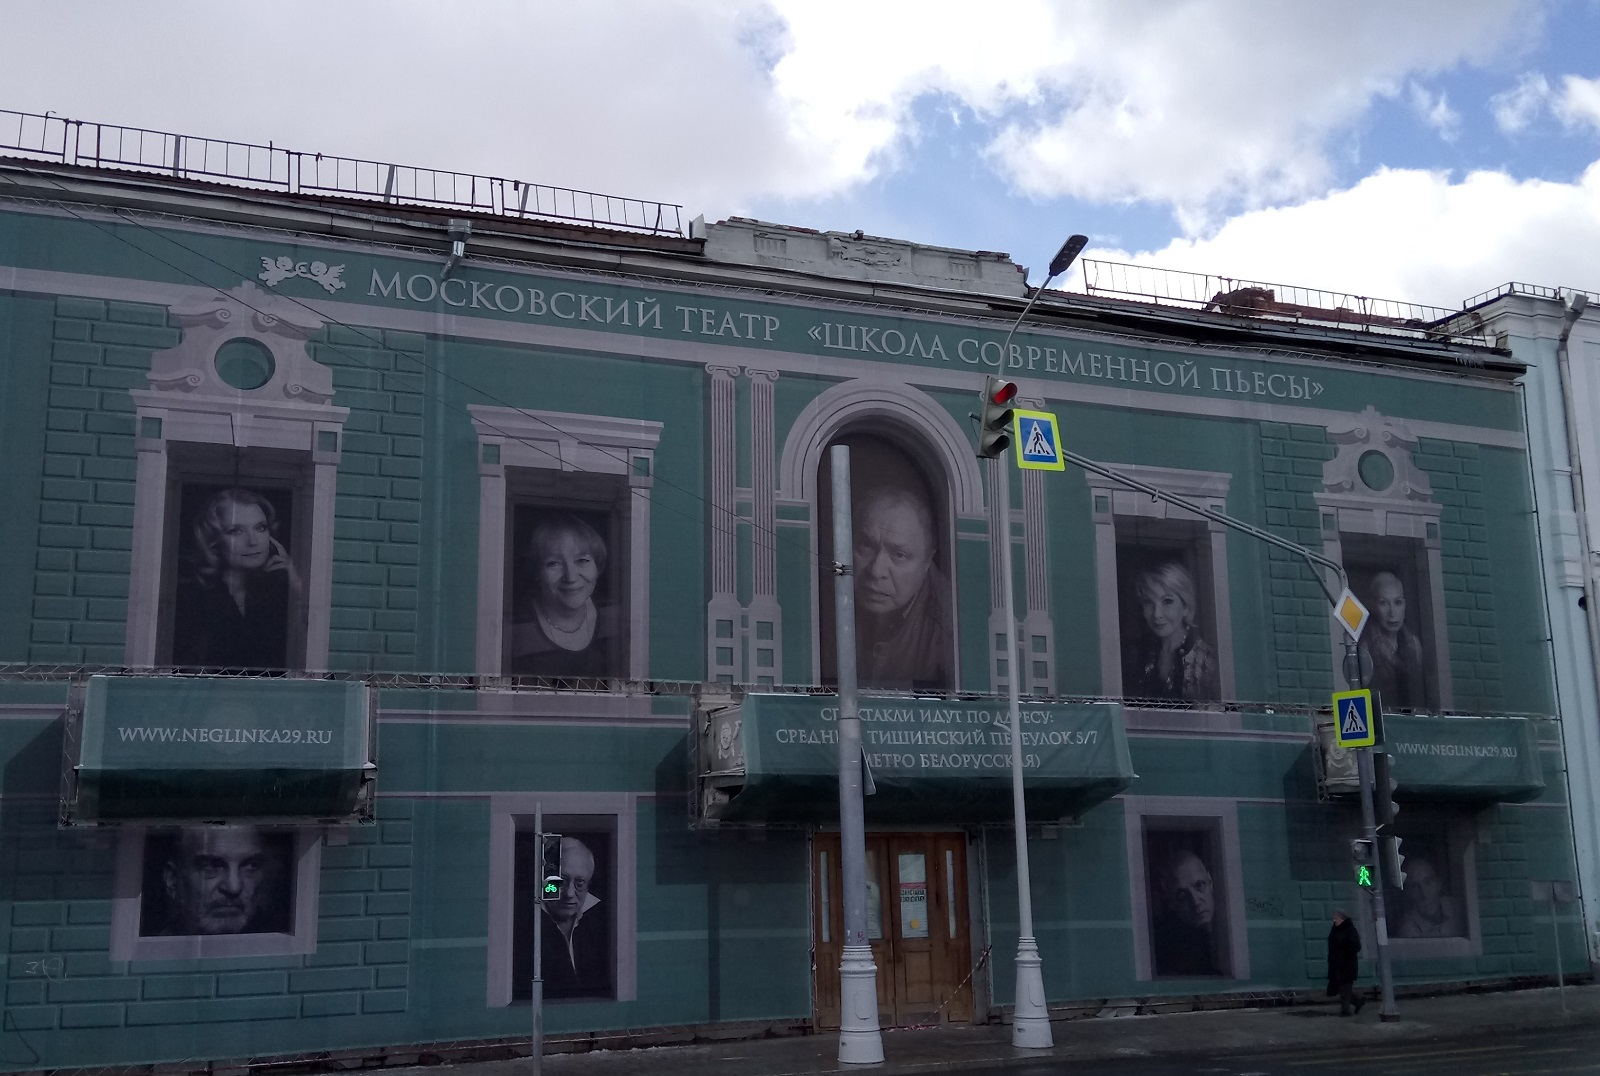 Moskva teater hus